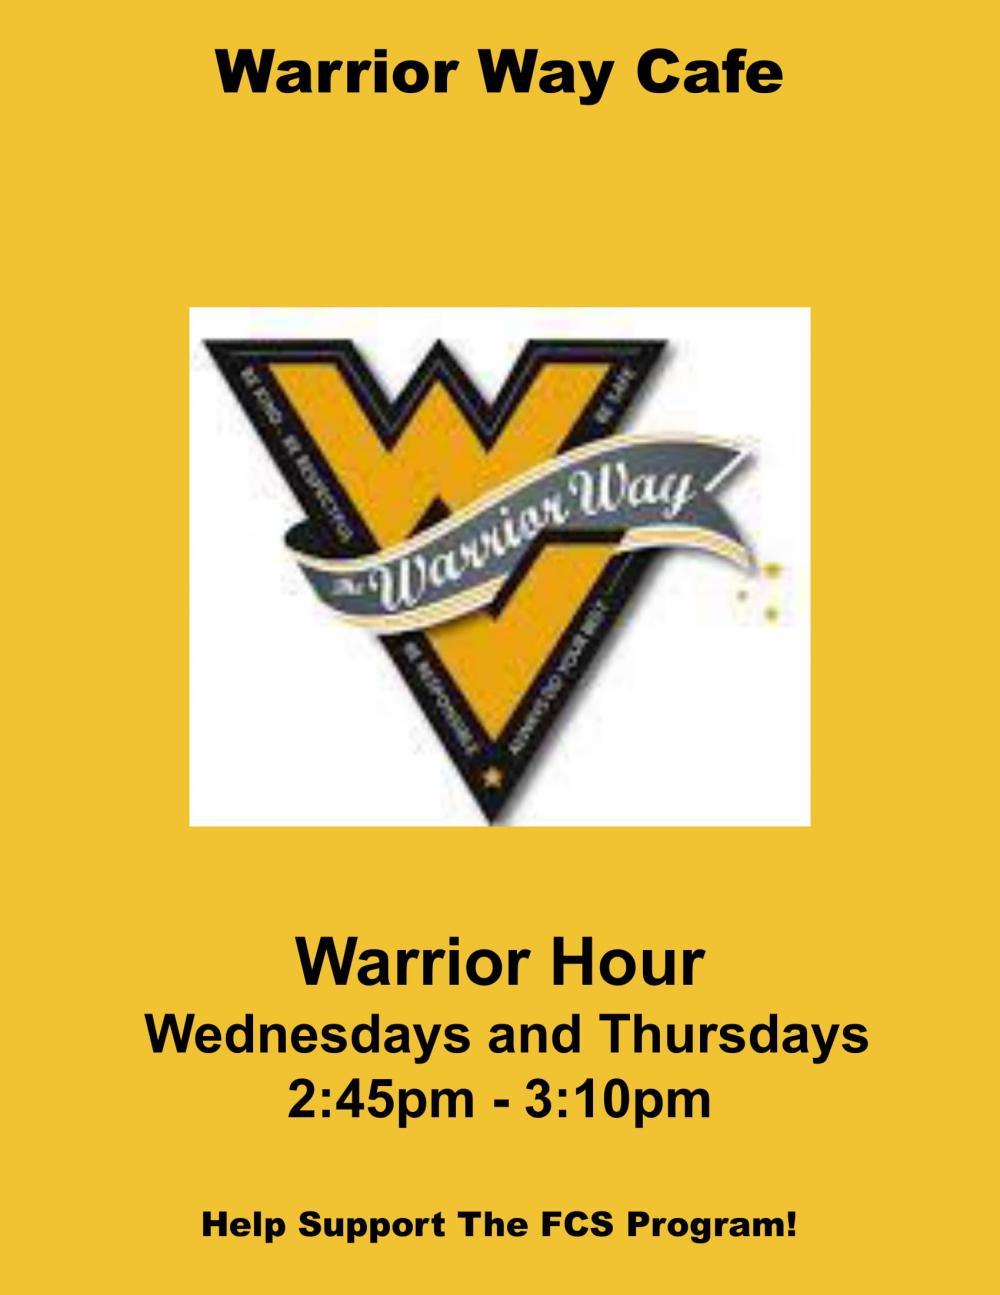 Warrior Way Cafe